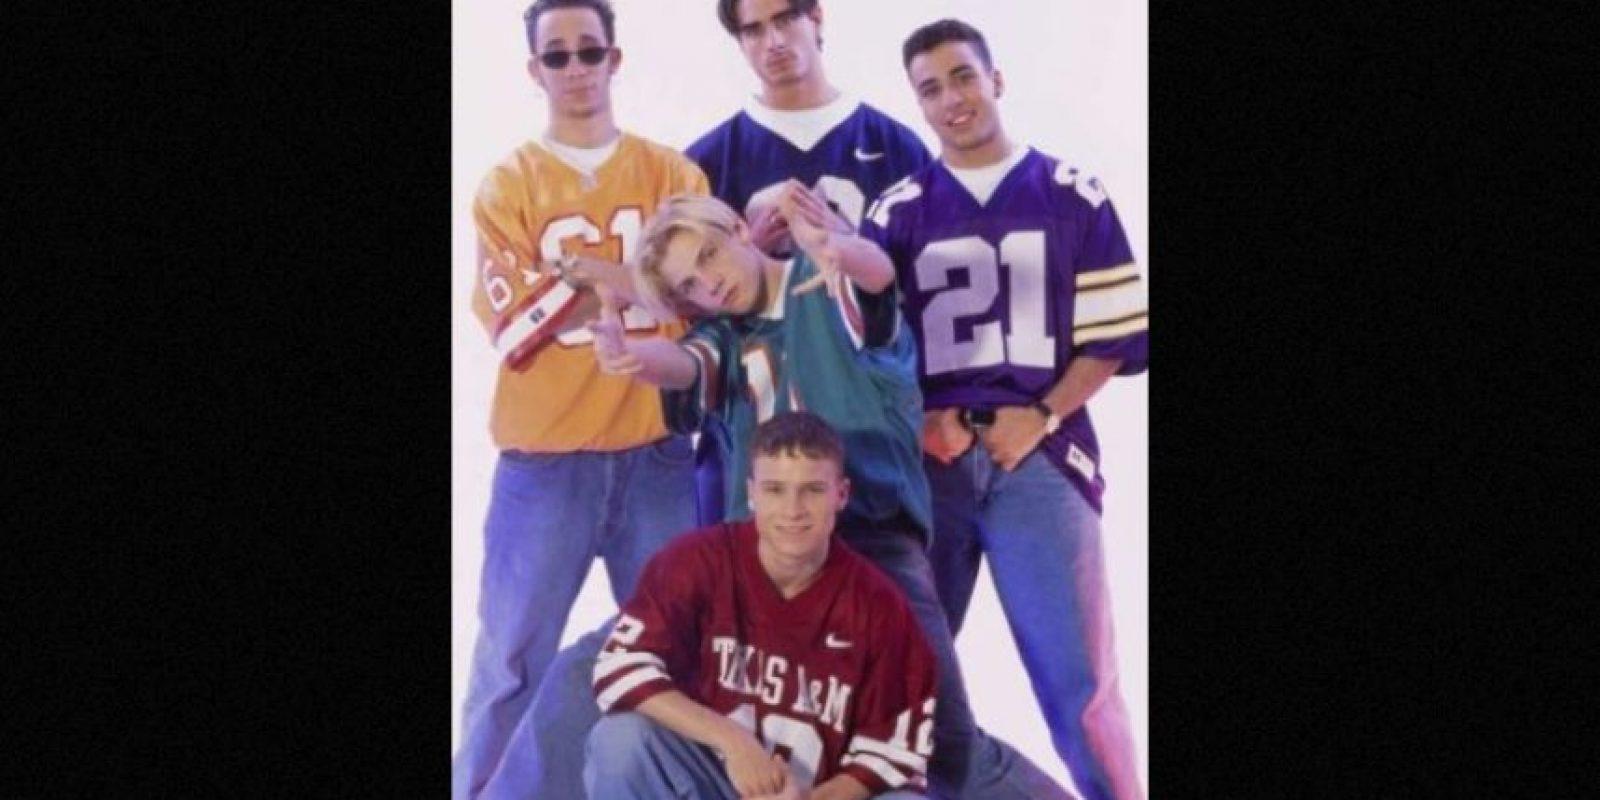 Backstreet Boys Foto:Facebook/BackstreetBoys